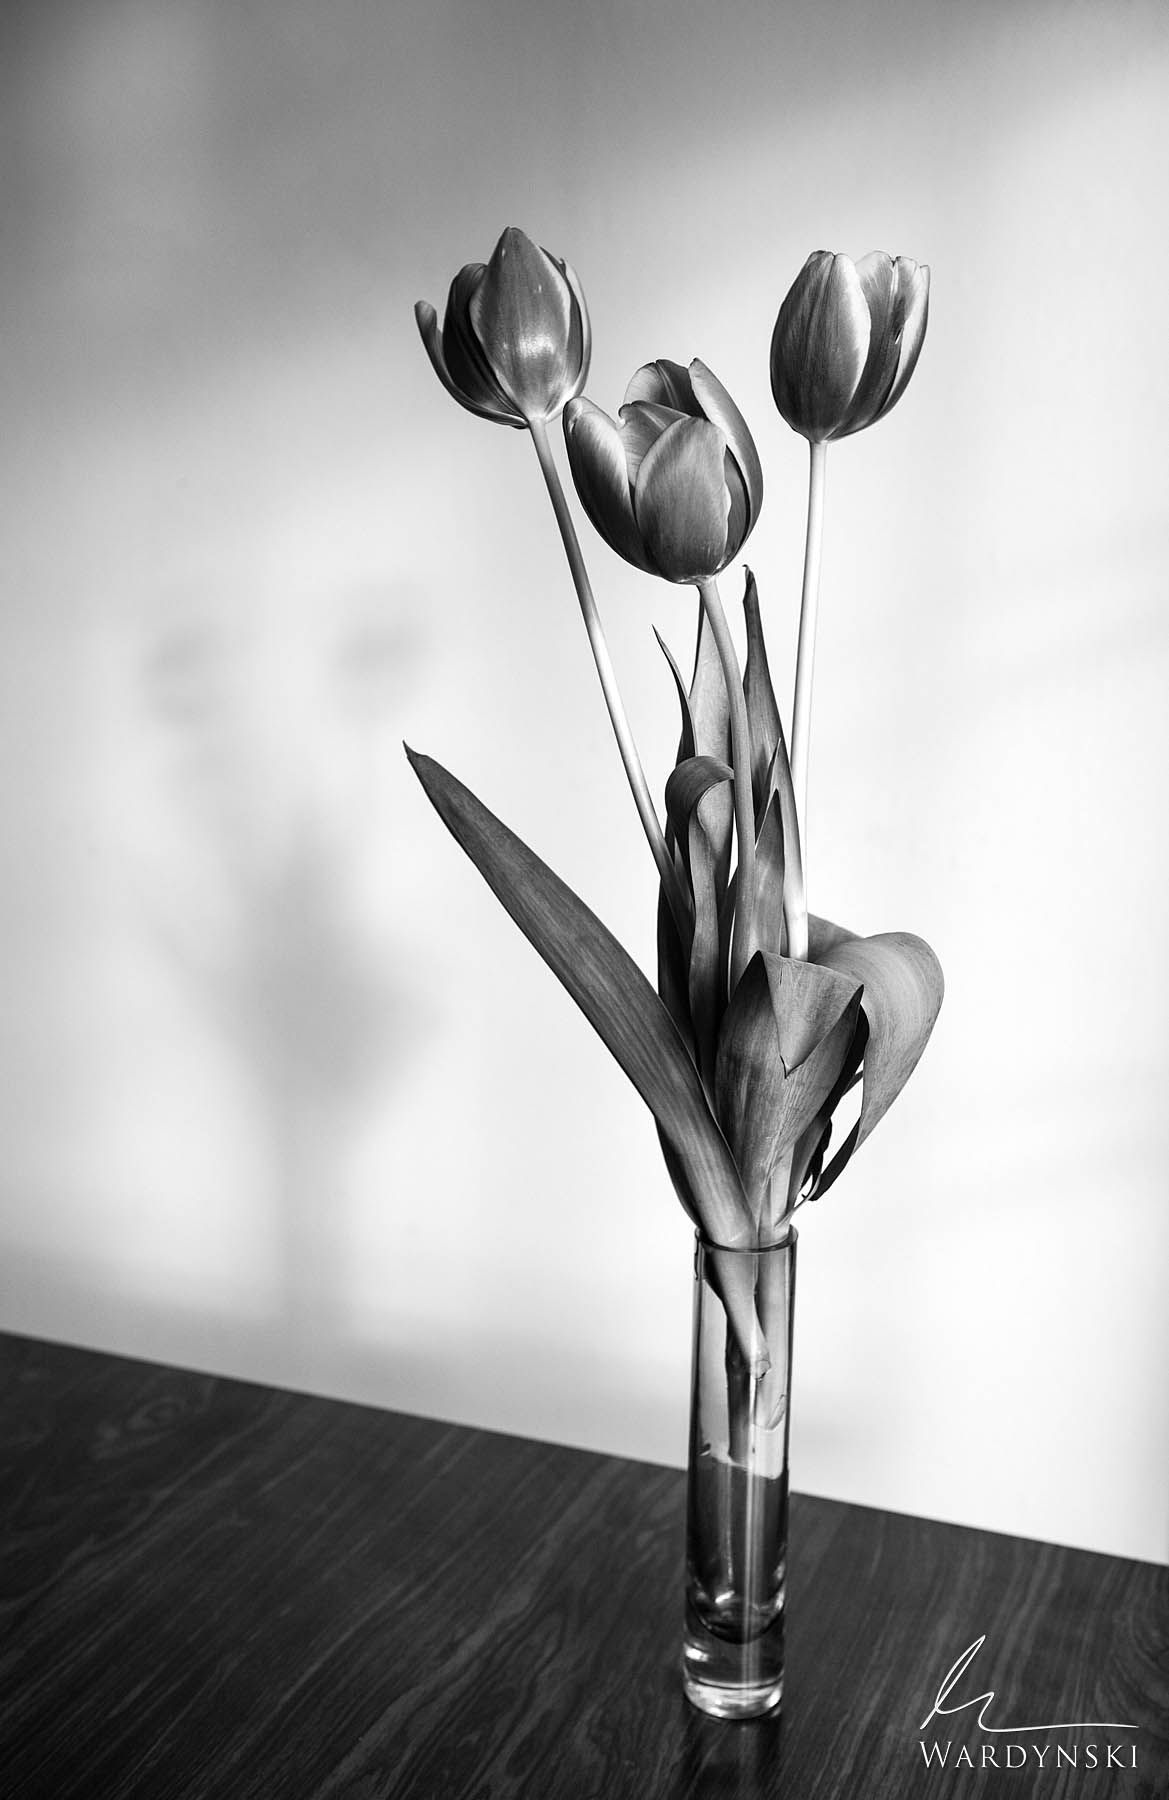 vertical, black and white, b&w, monochrome, flower